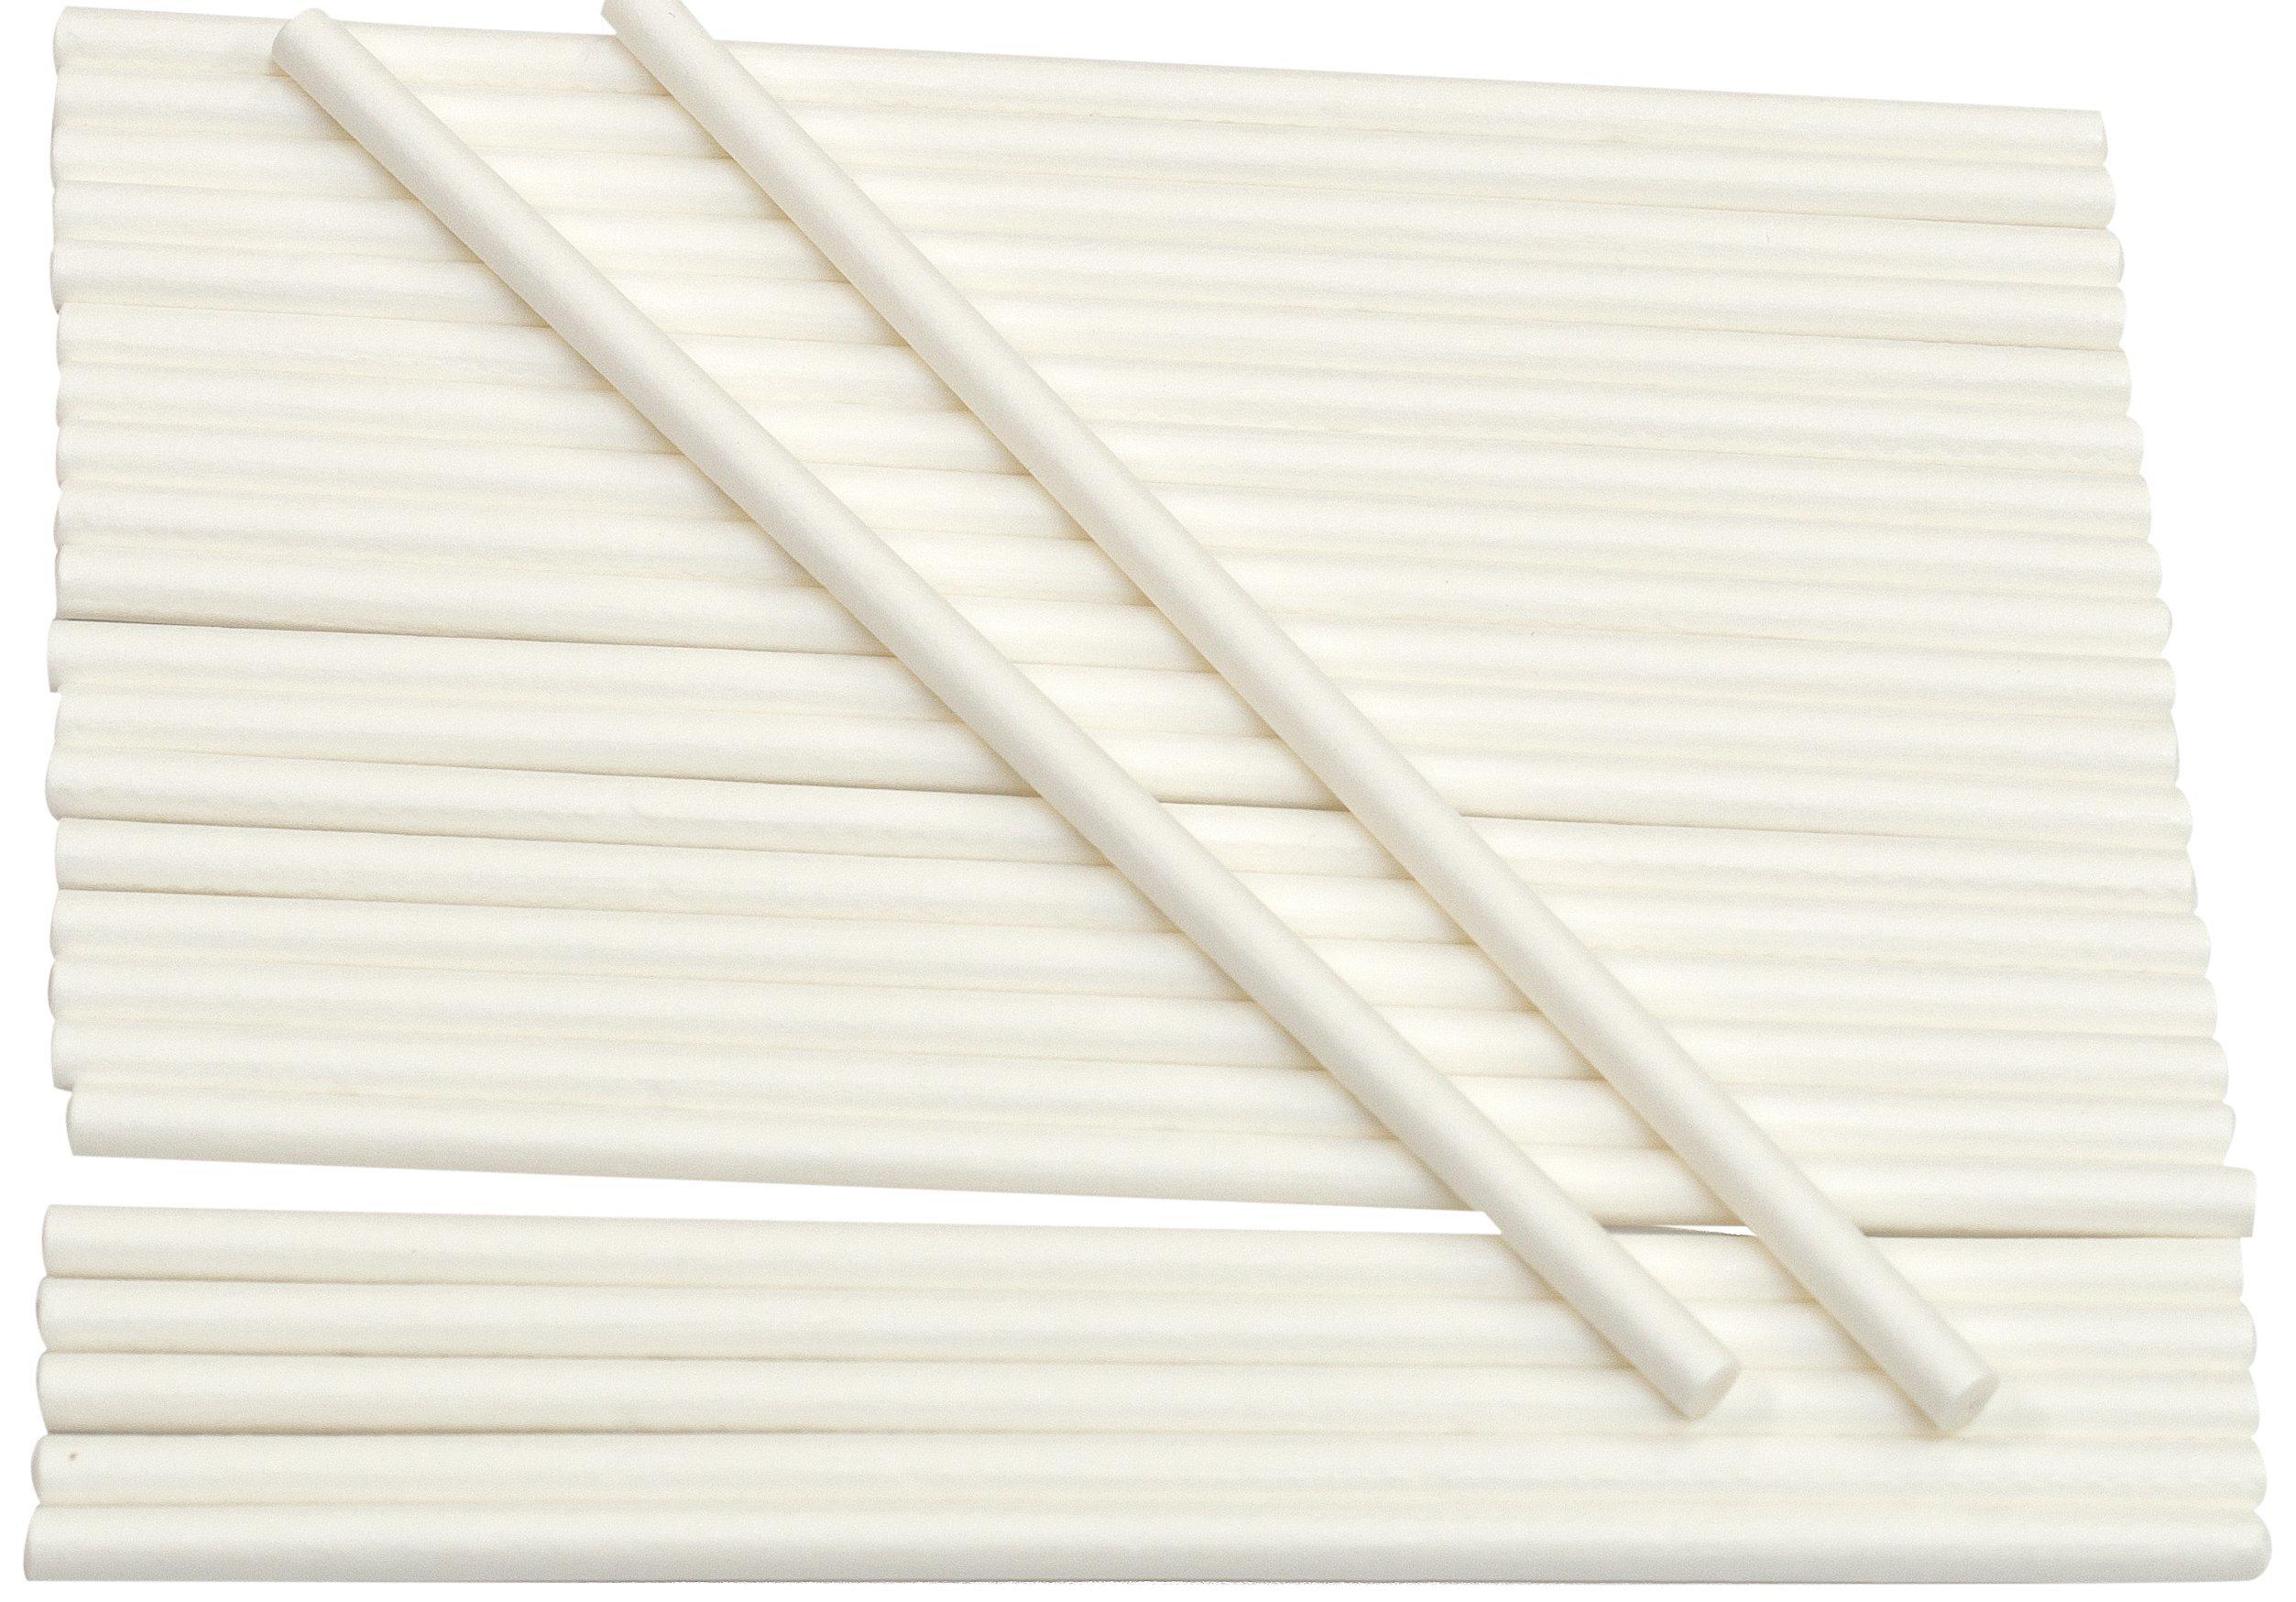 Cybrtrayd Paper Lollipop Sticks, 6-Inch by 7/32-Inch, Case of 5300 by CybrTrayd (Image #1)